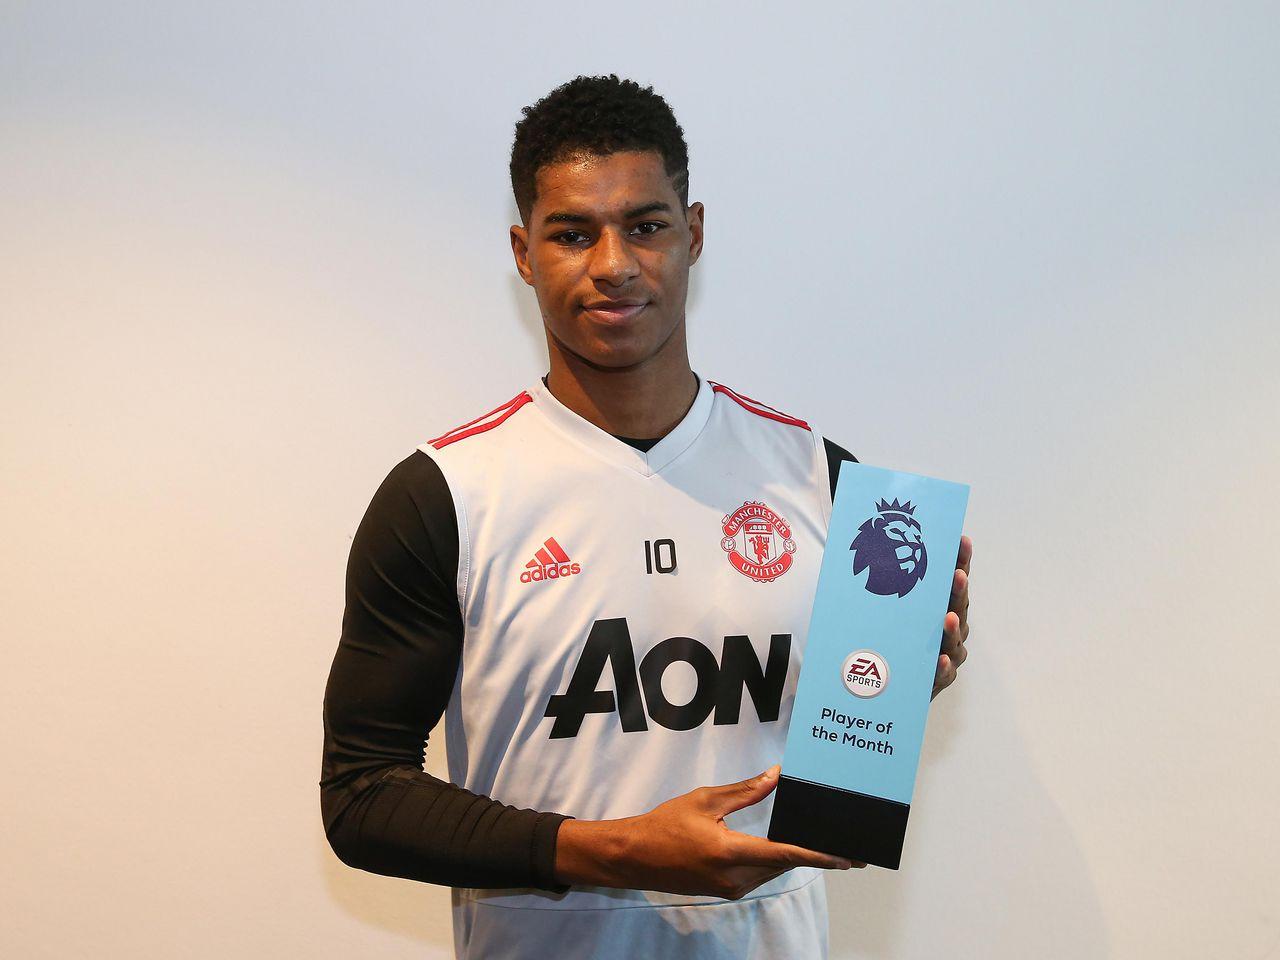 Man Utd Forward Marcus Rashford Nominated For Pfa Young Player Of The Year Award Manchester United